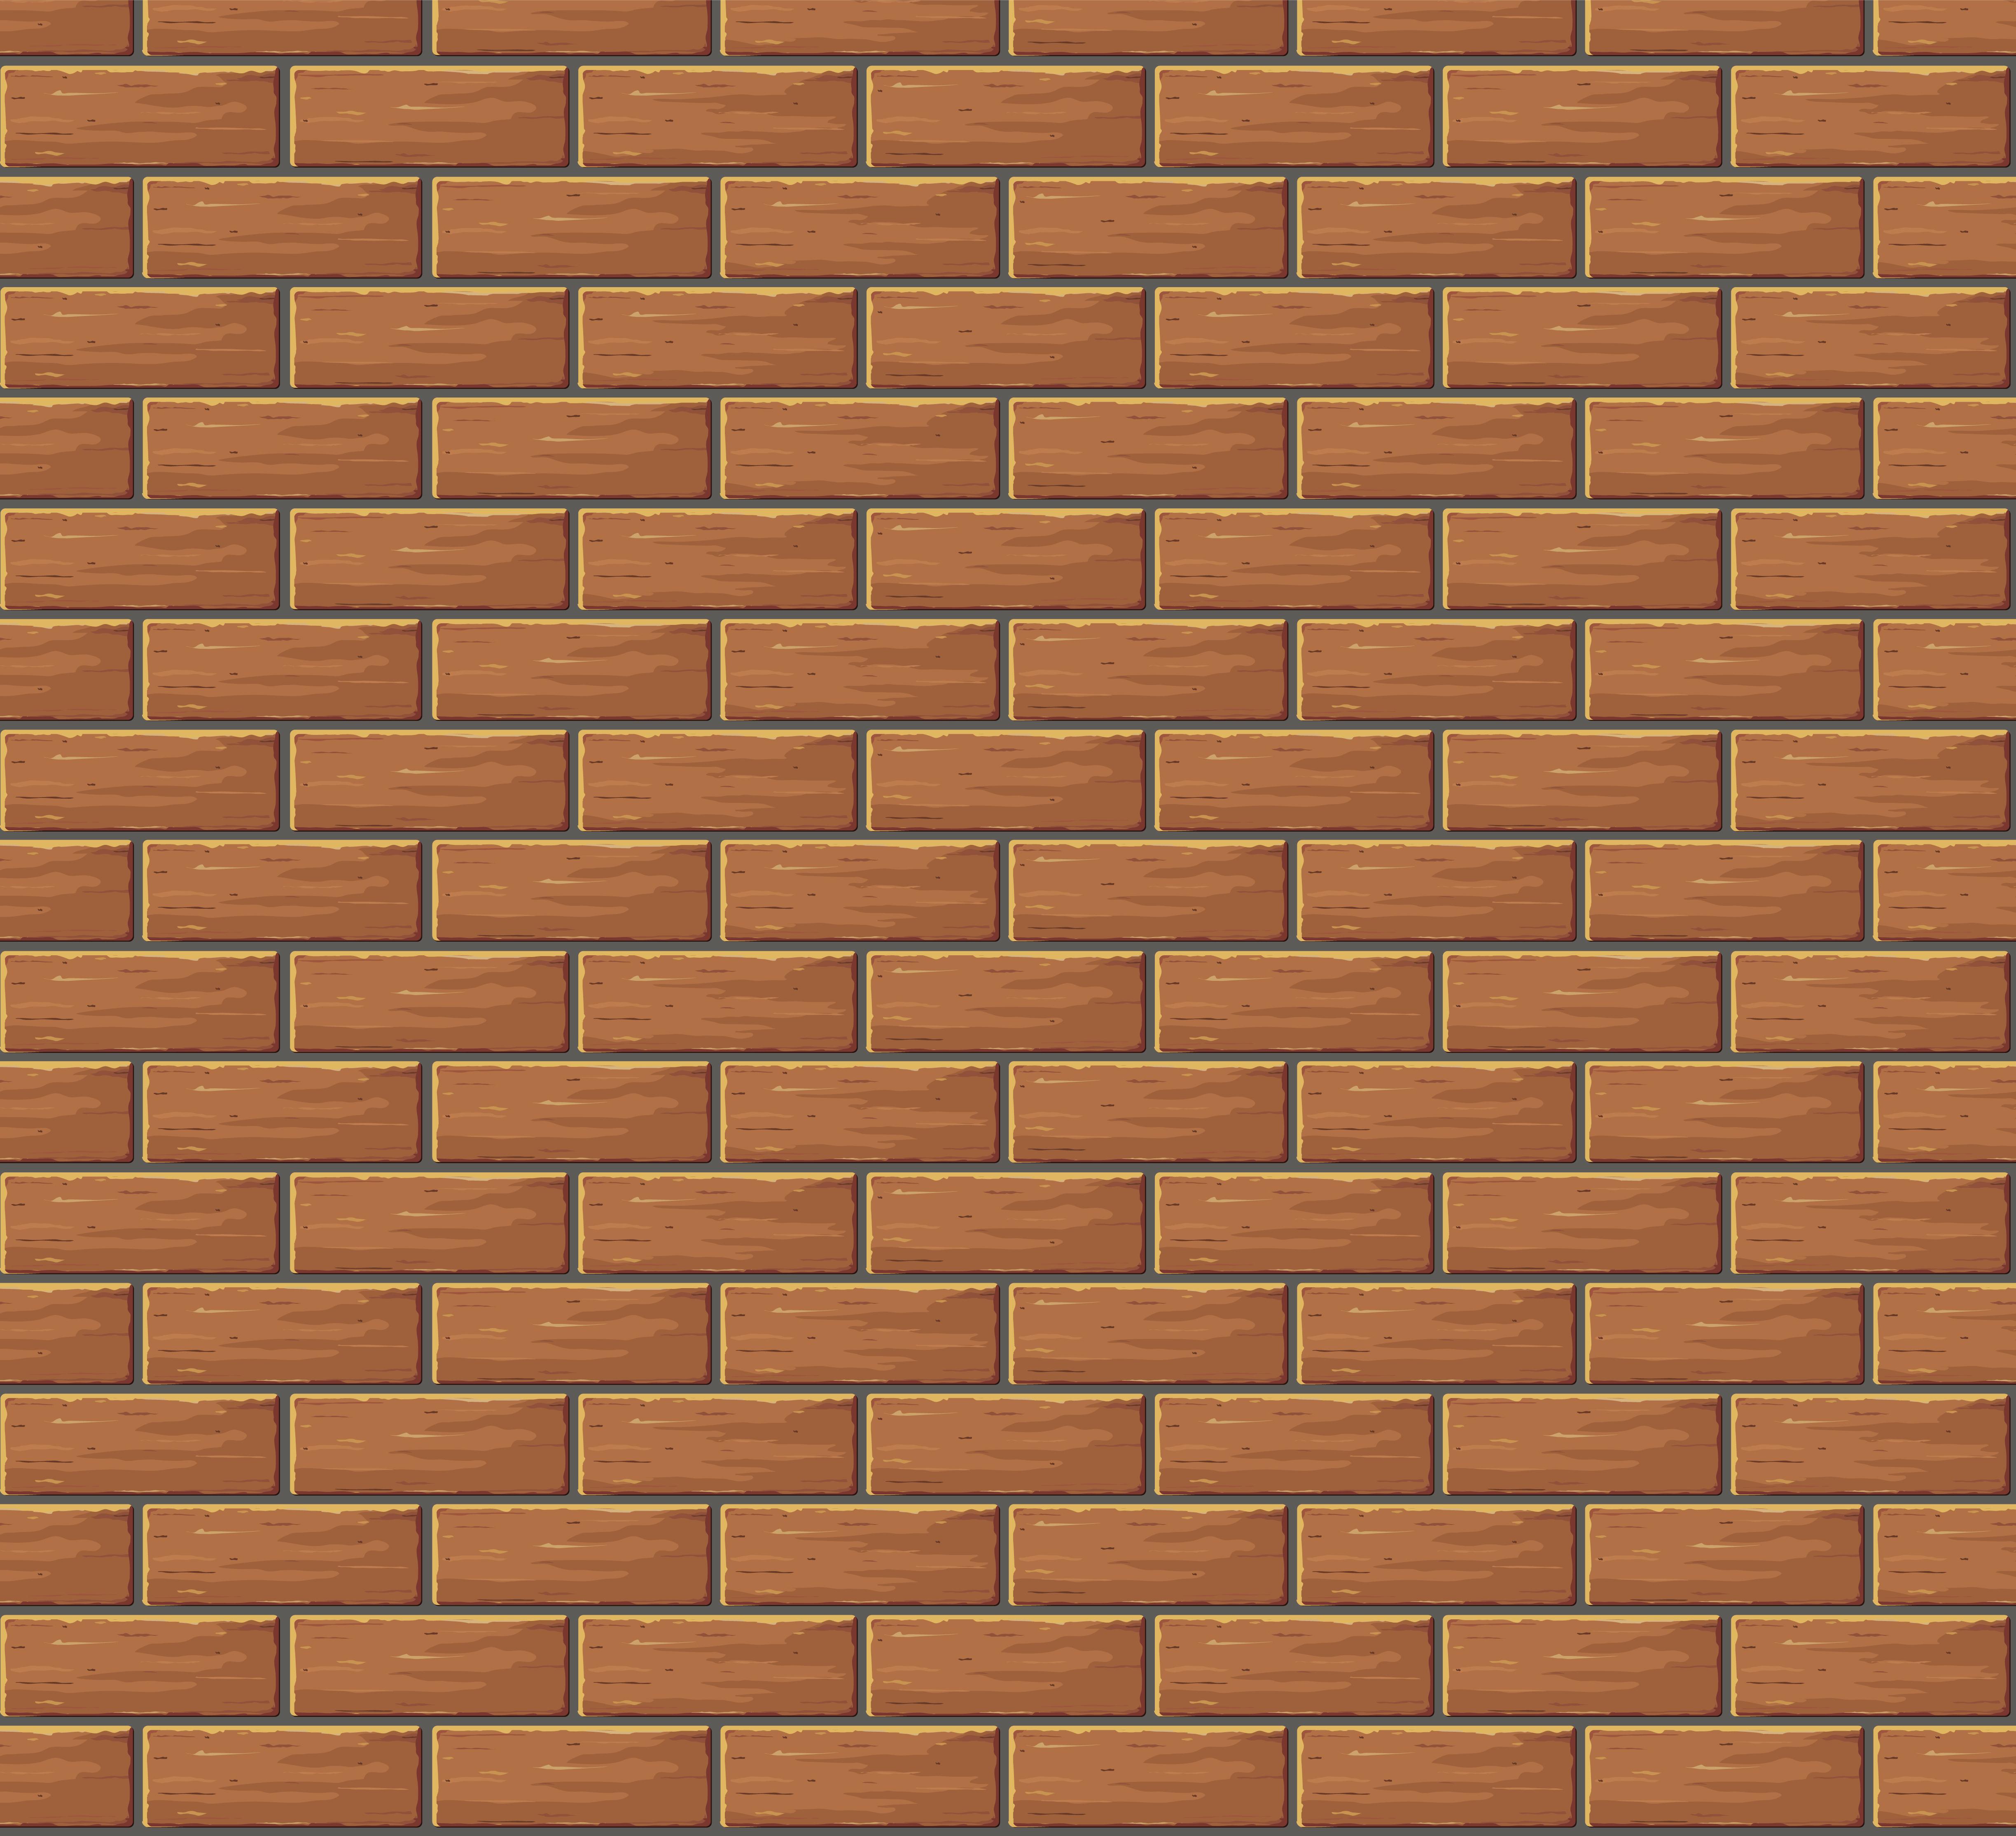 Brick clipart brick wall background Wall  size Brick available